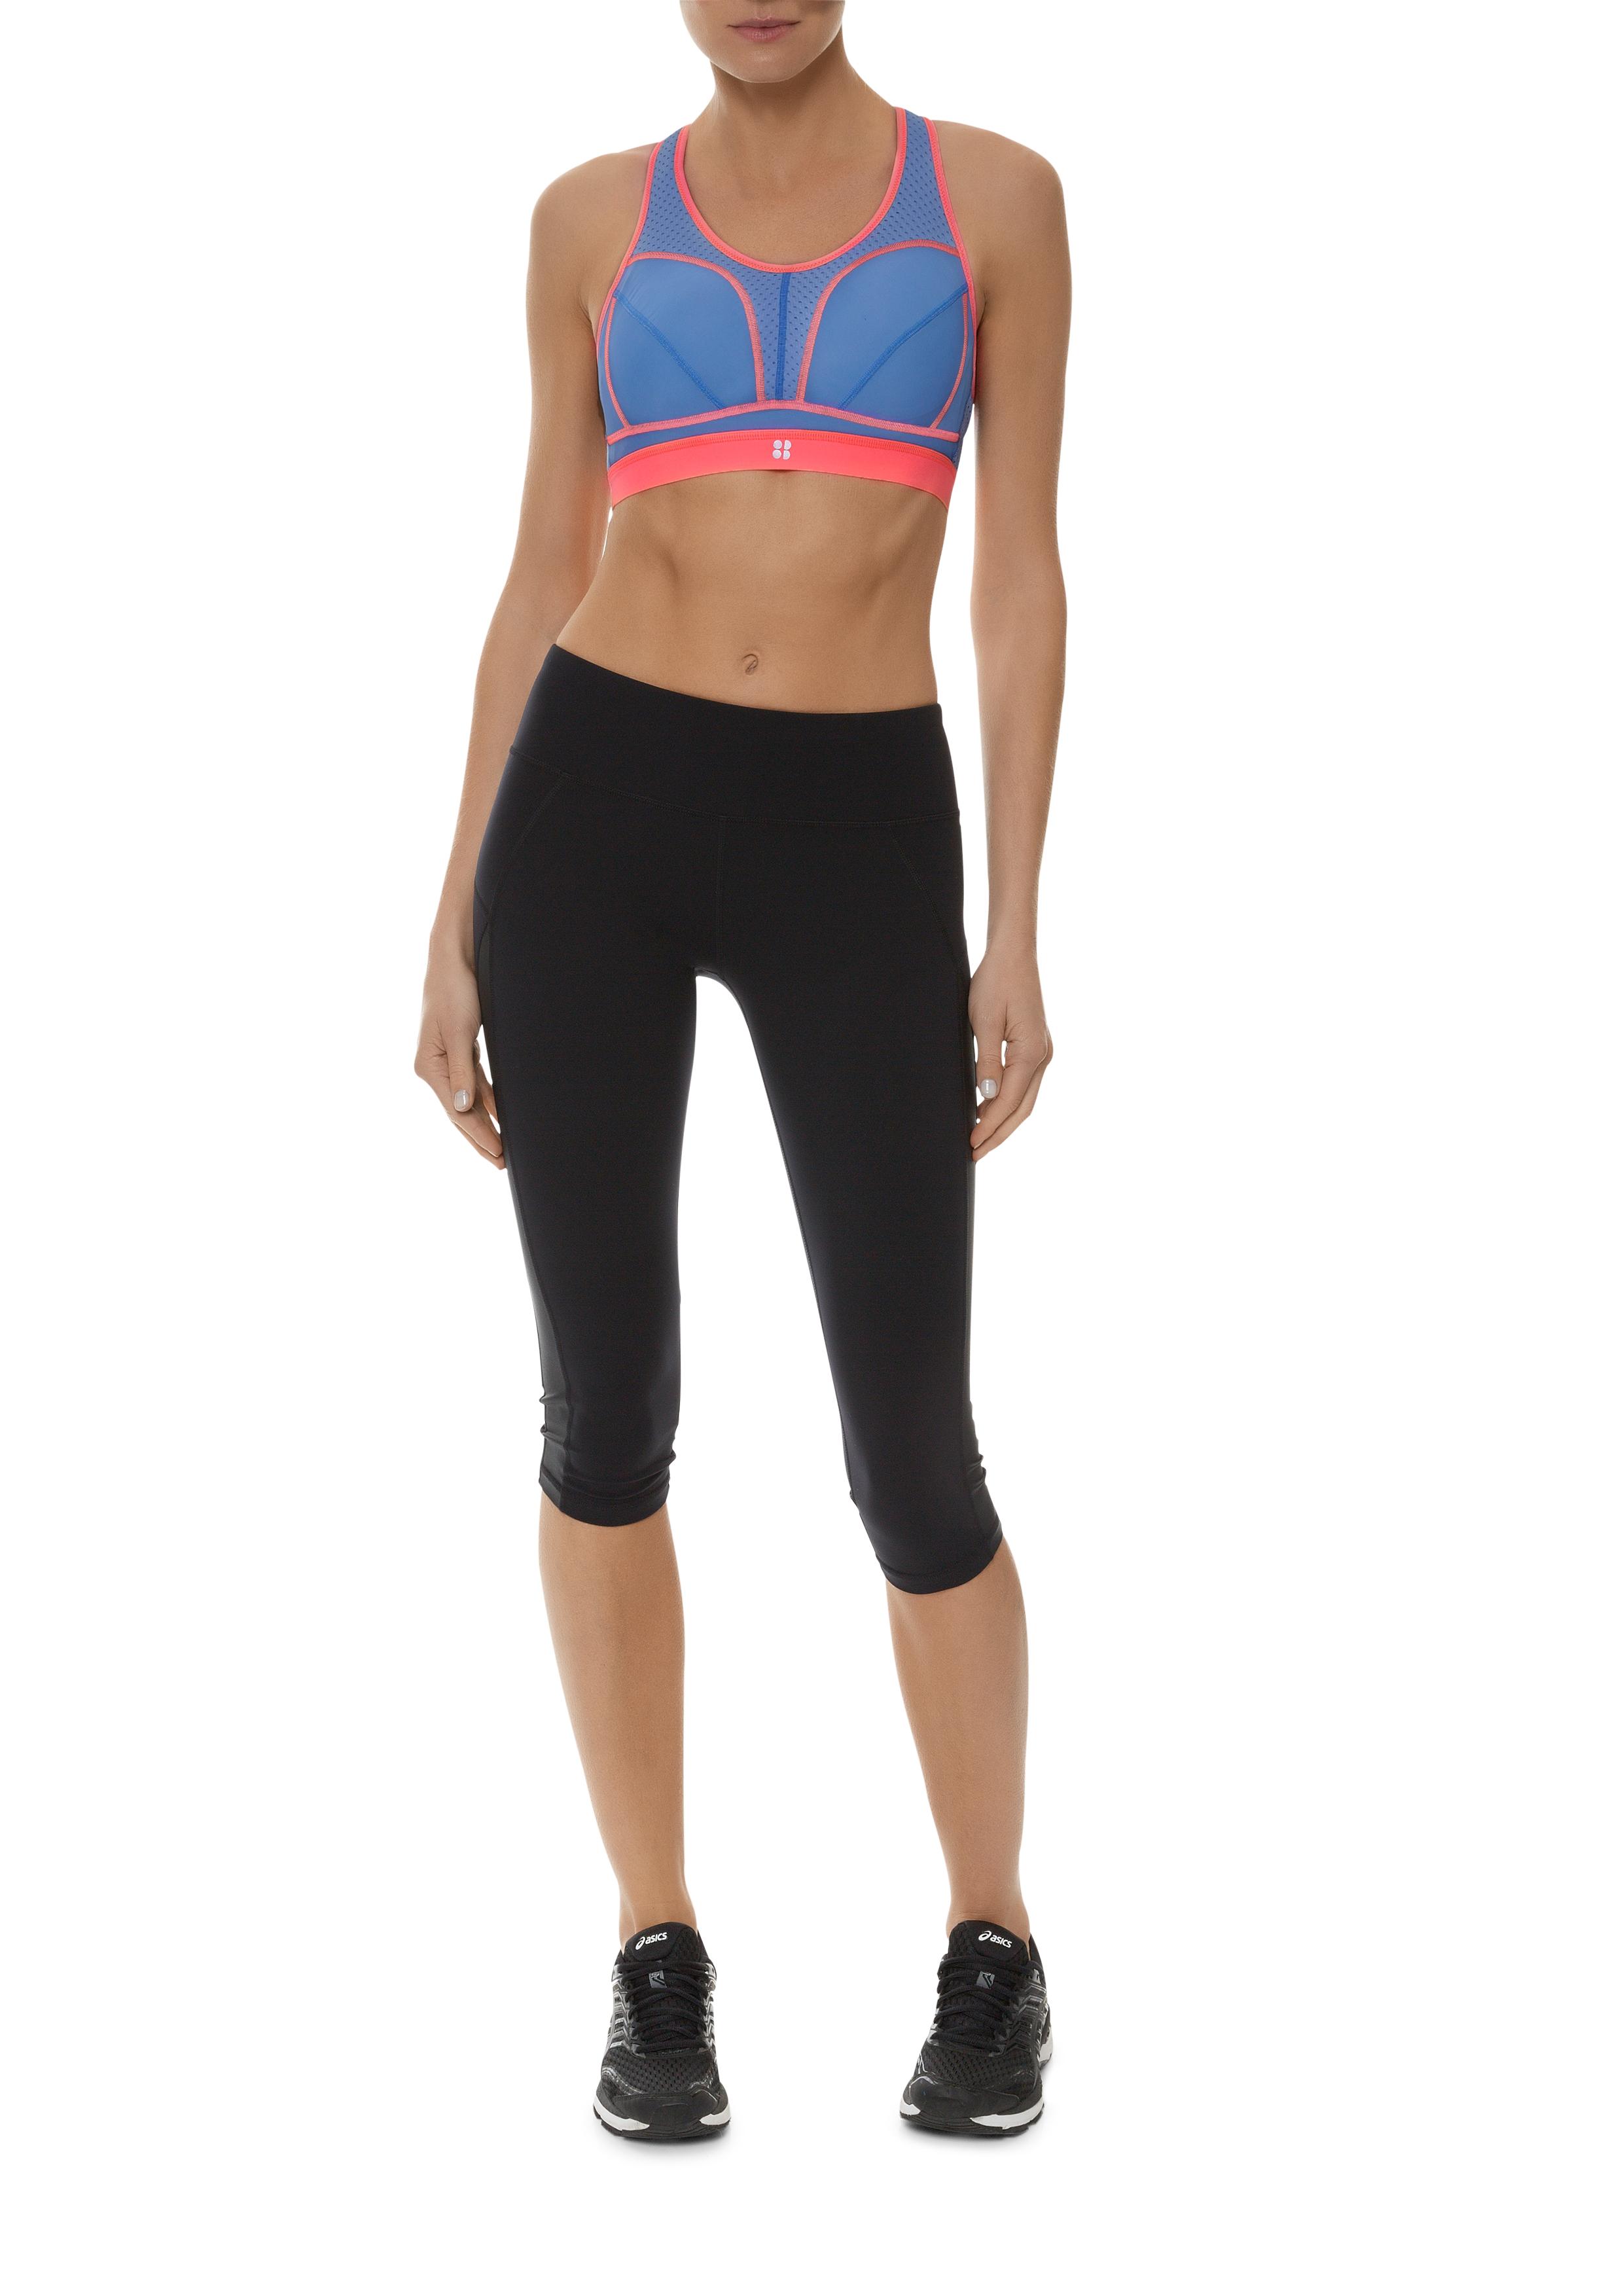 0e08b7c8f98bb How Sweaty Betty is Revolutionizing Sports Bras and Empowering Women ...